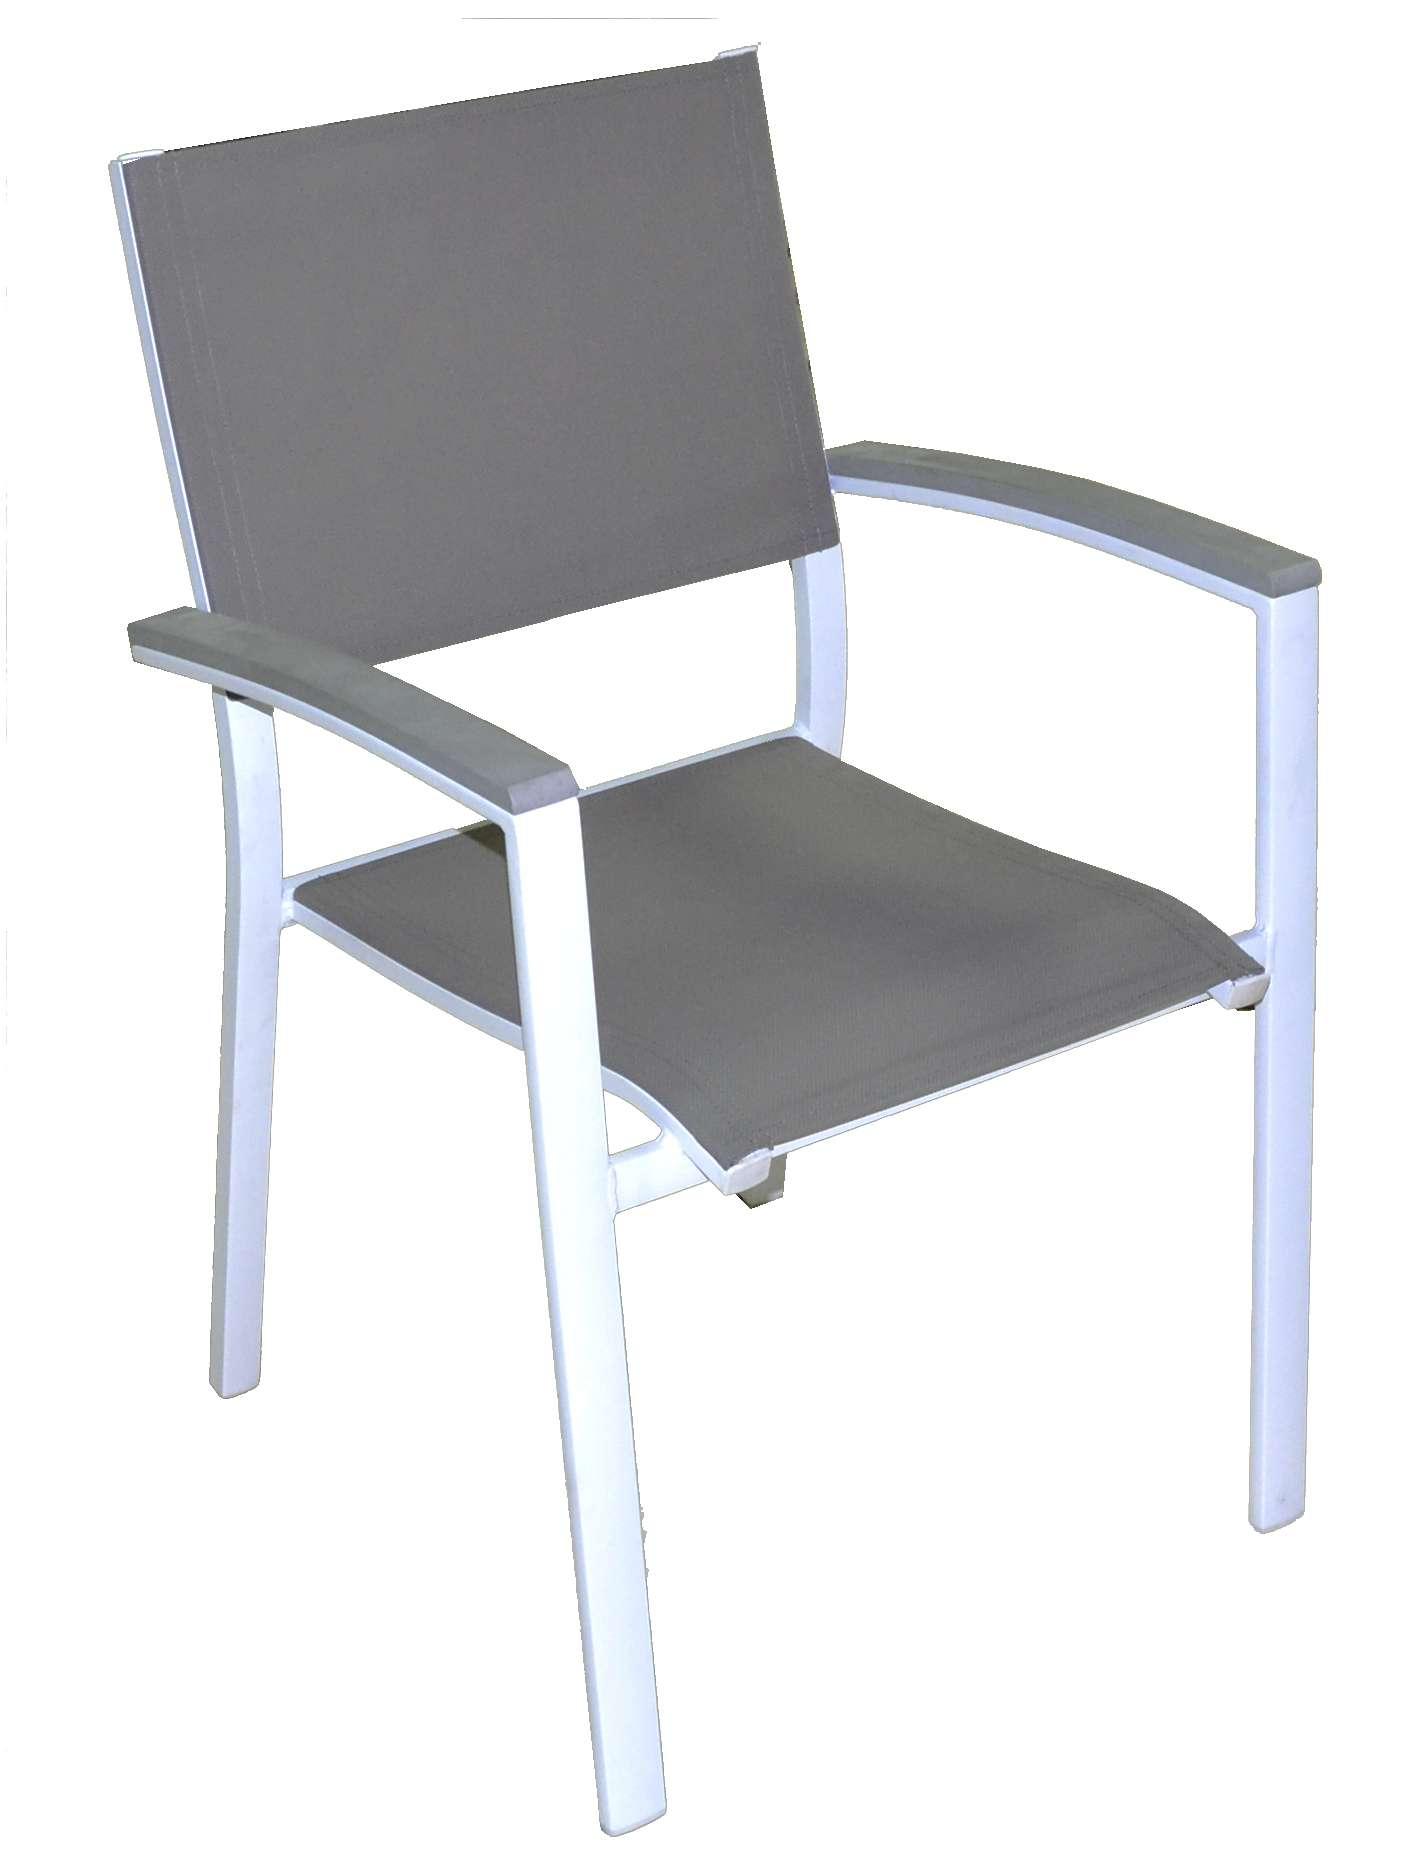 Sedia volterra greenwood mobili da giardino for Feltrini antirumore per sedie